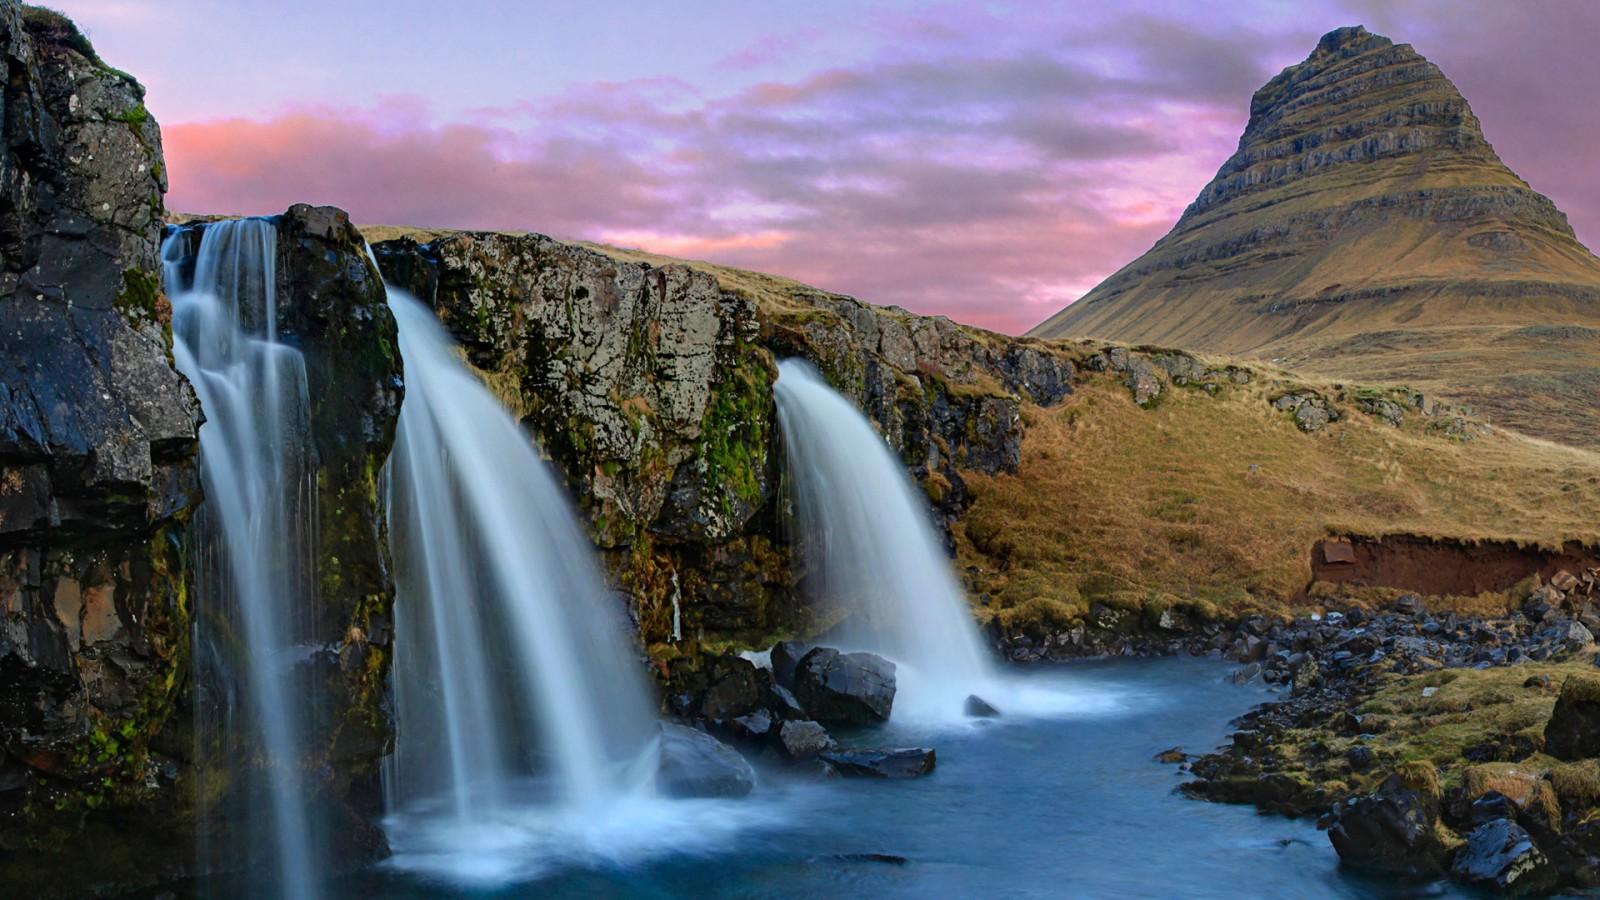 3d Wallpaper Widescreen Waterfalls Kirkjufell Mountain Waterfalls Iceland Wallpapers Hd